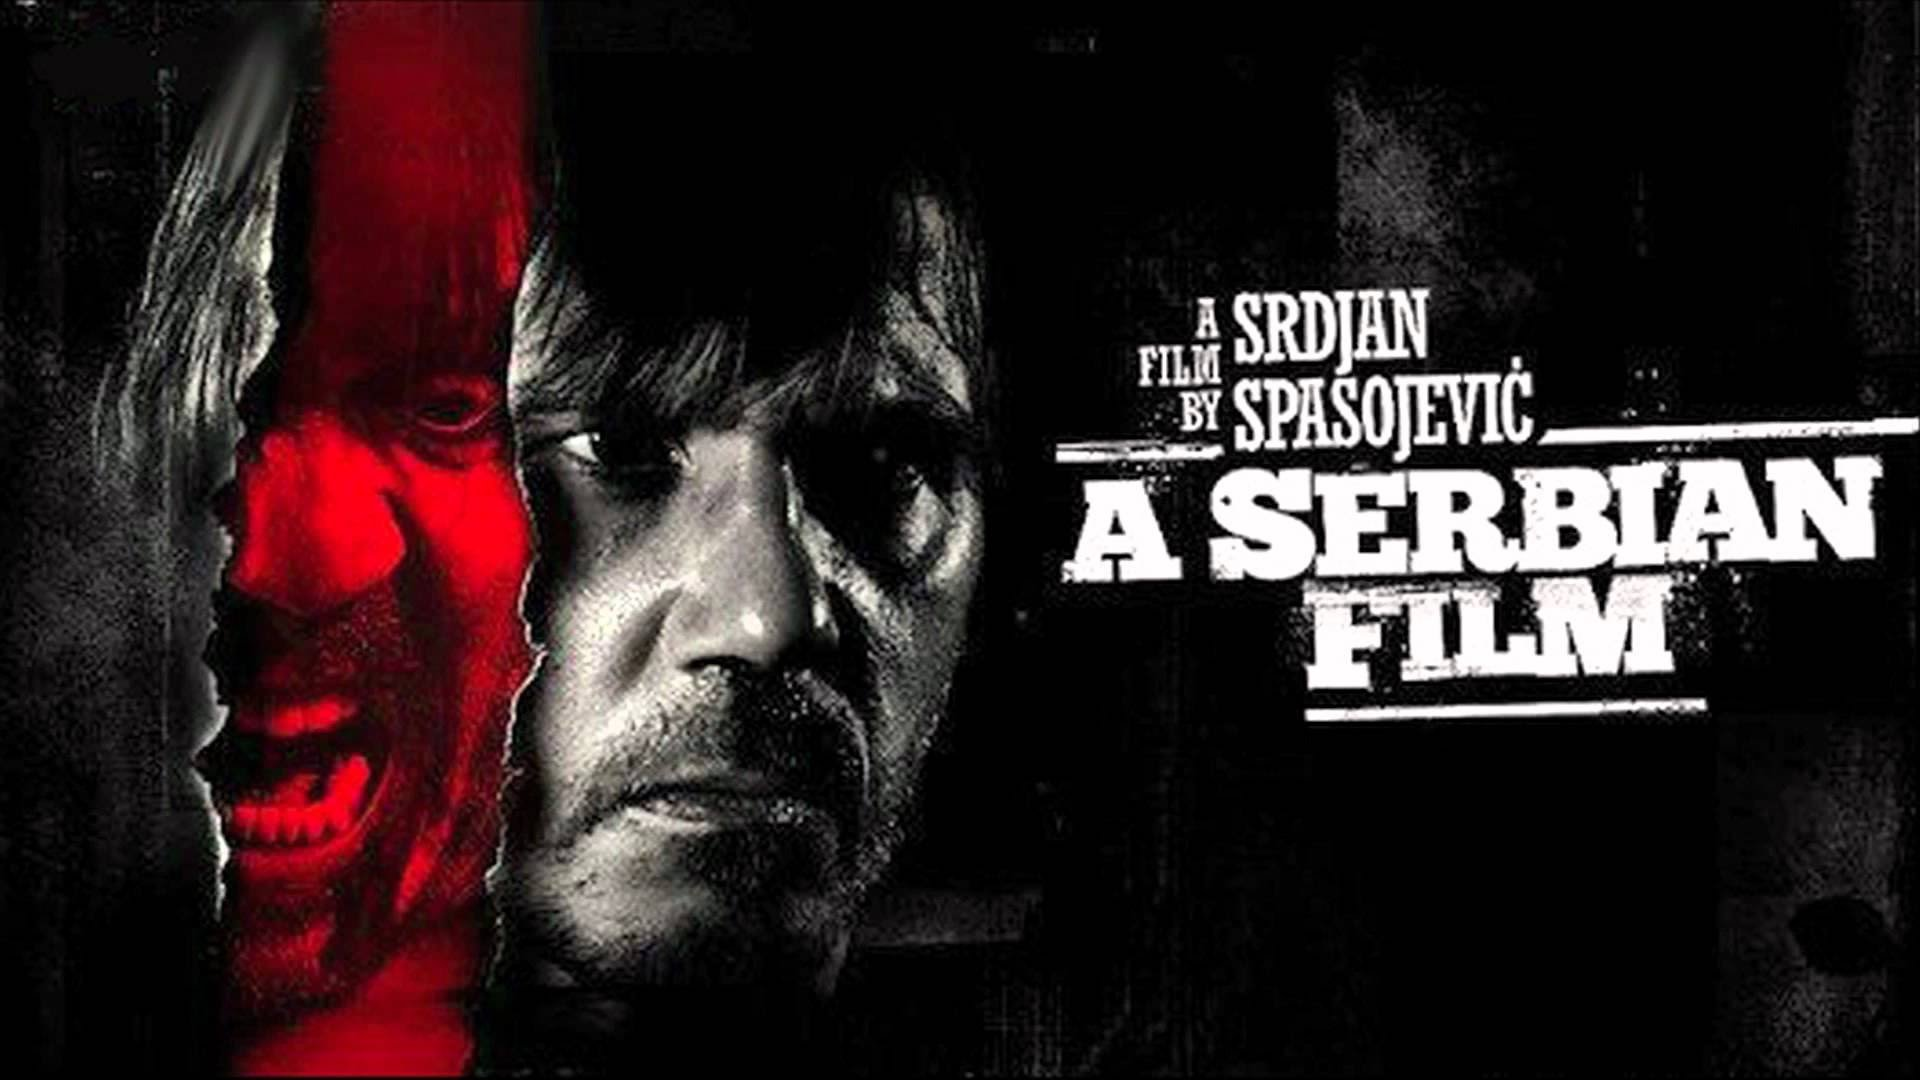 A Serbian Film Porno a serbian film   know your meme